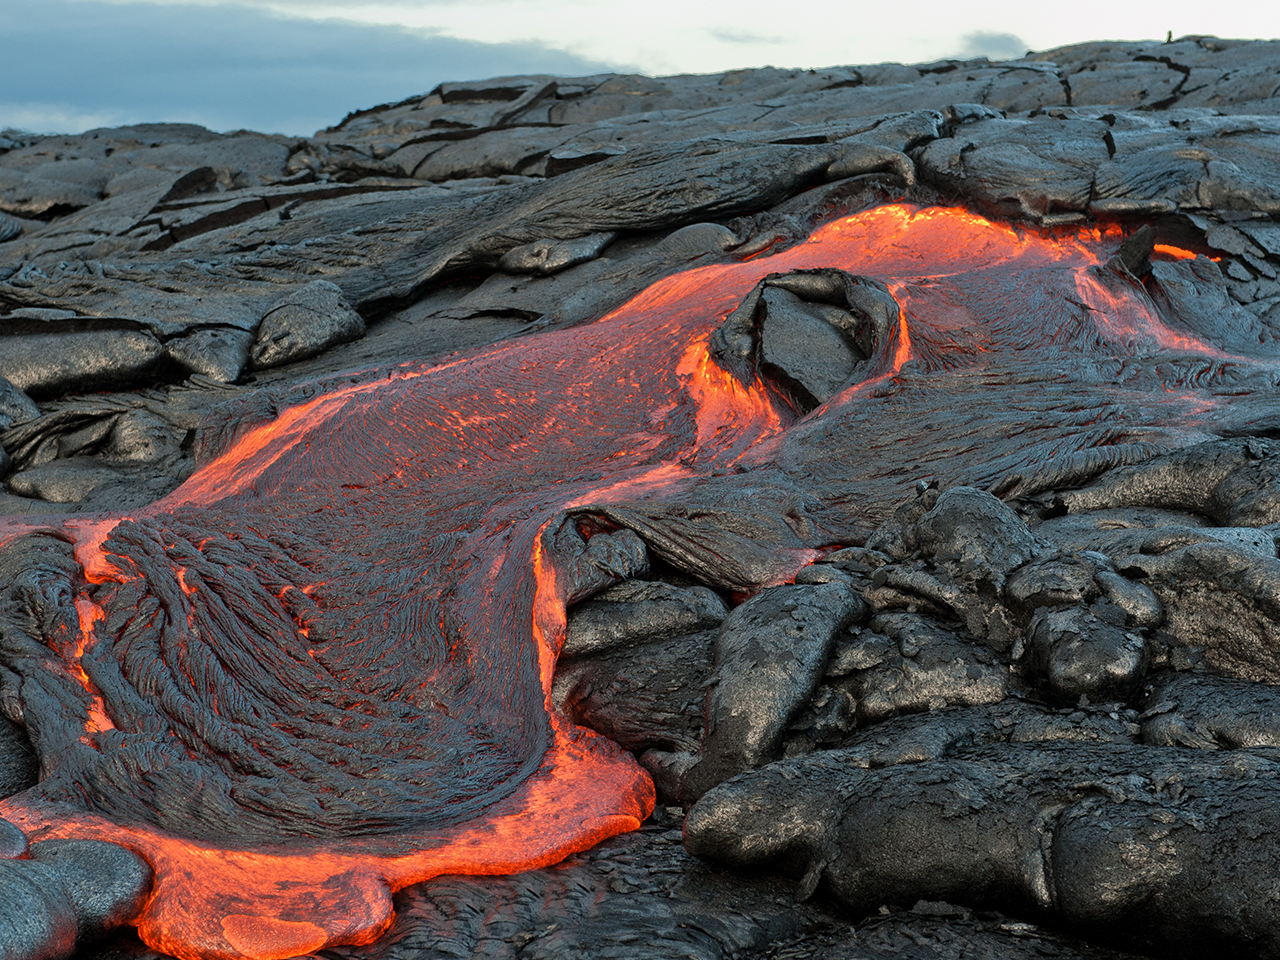 The Big Island's Big Volcano